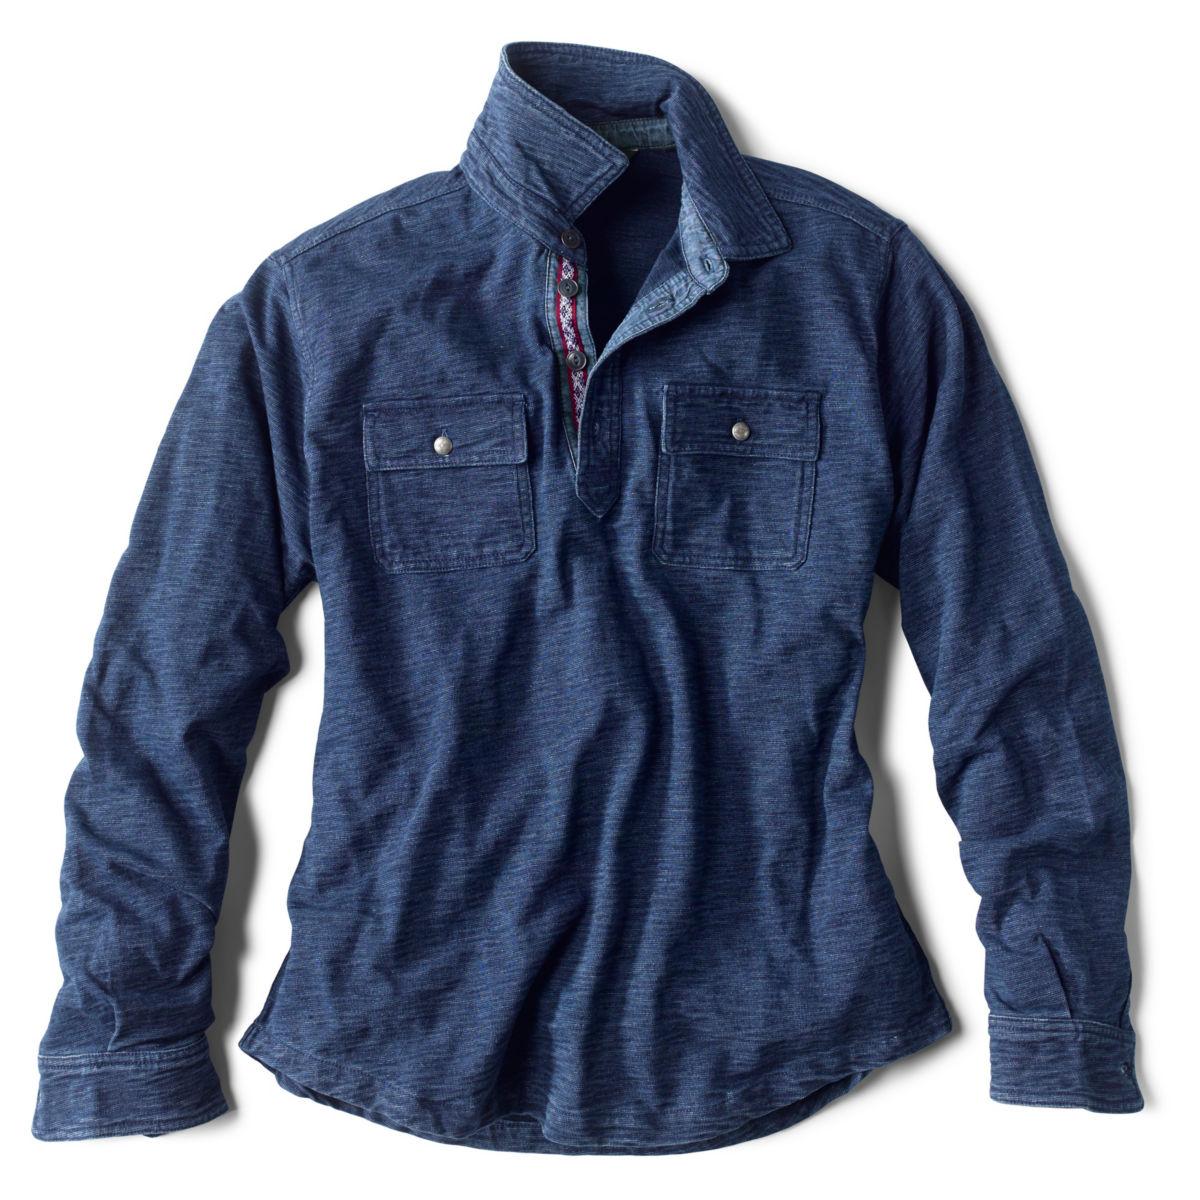 Long-Sleeved Indigo Button Pullover - INDIGOimage number 0